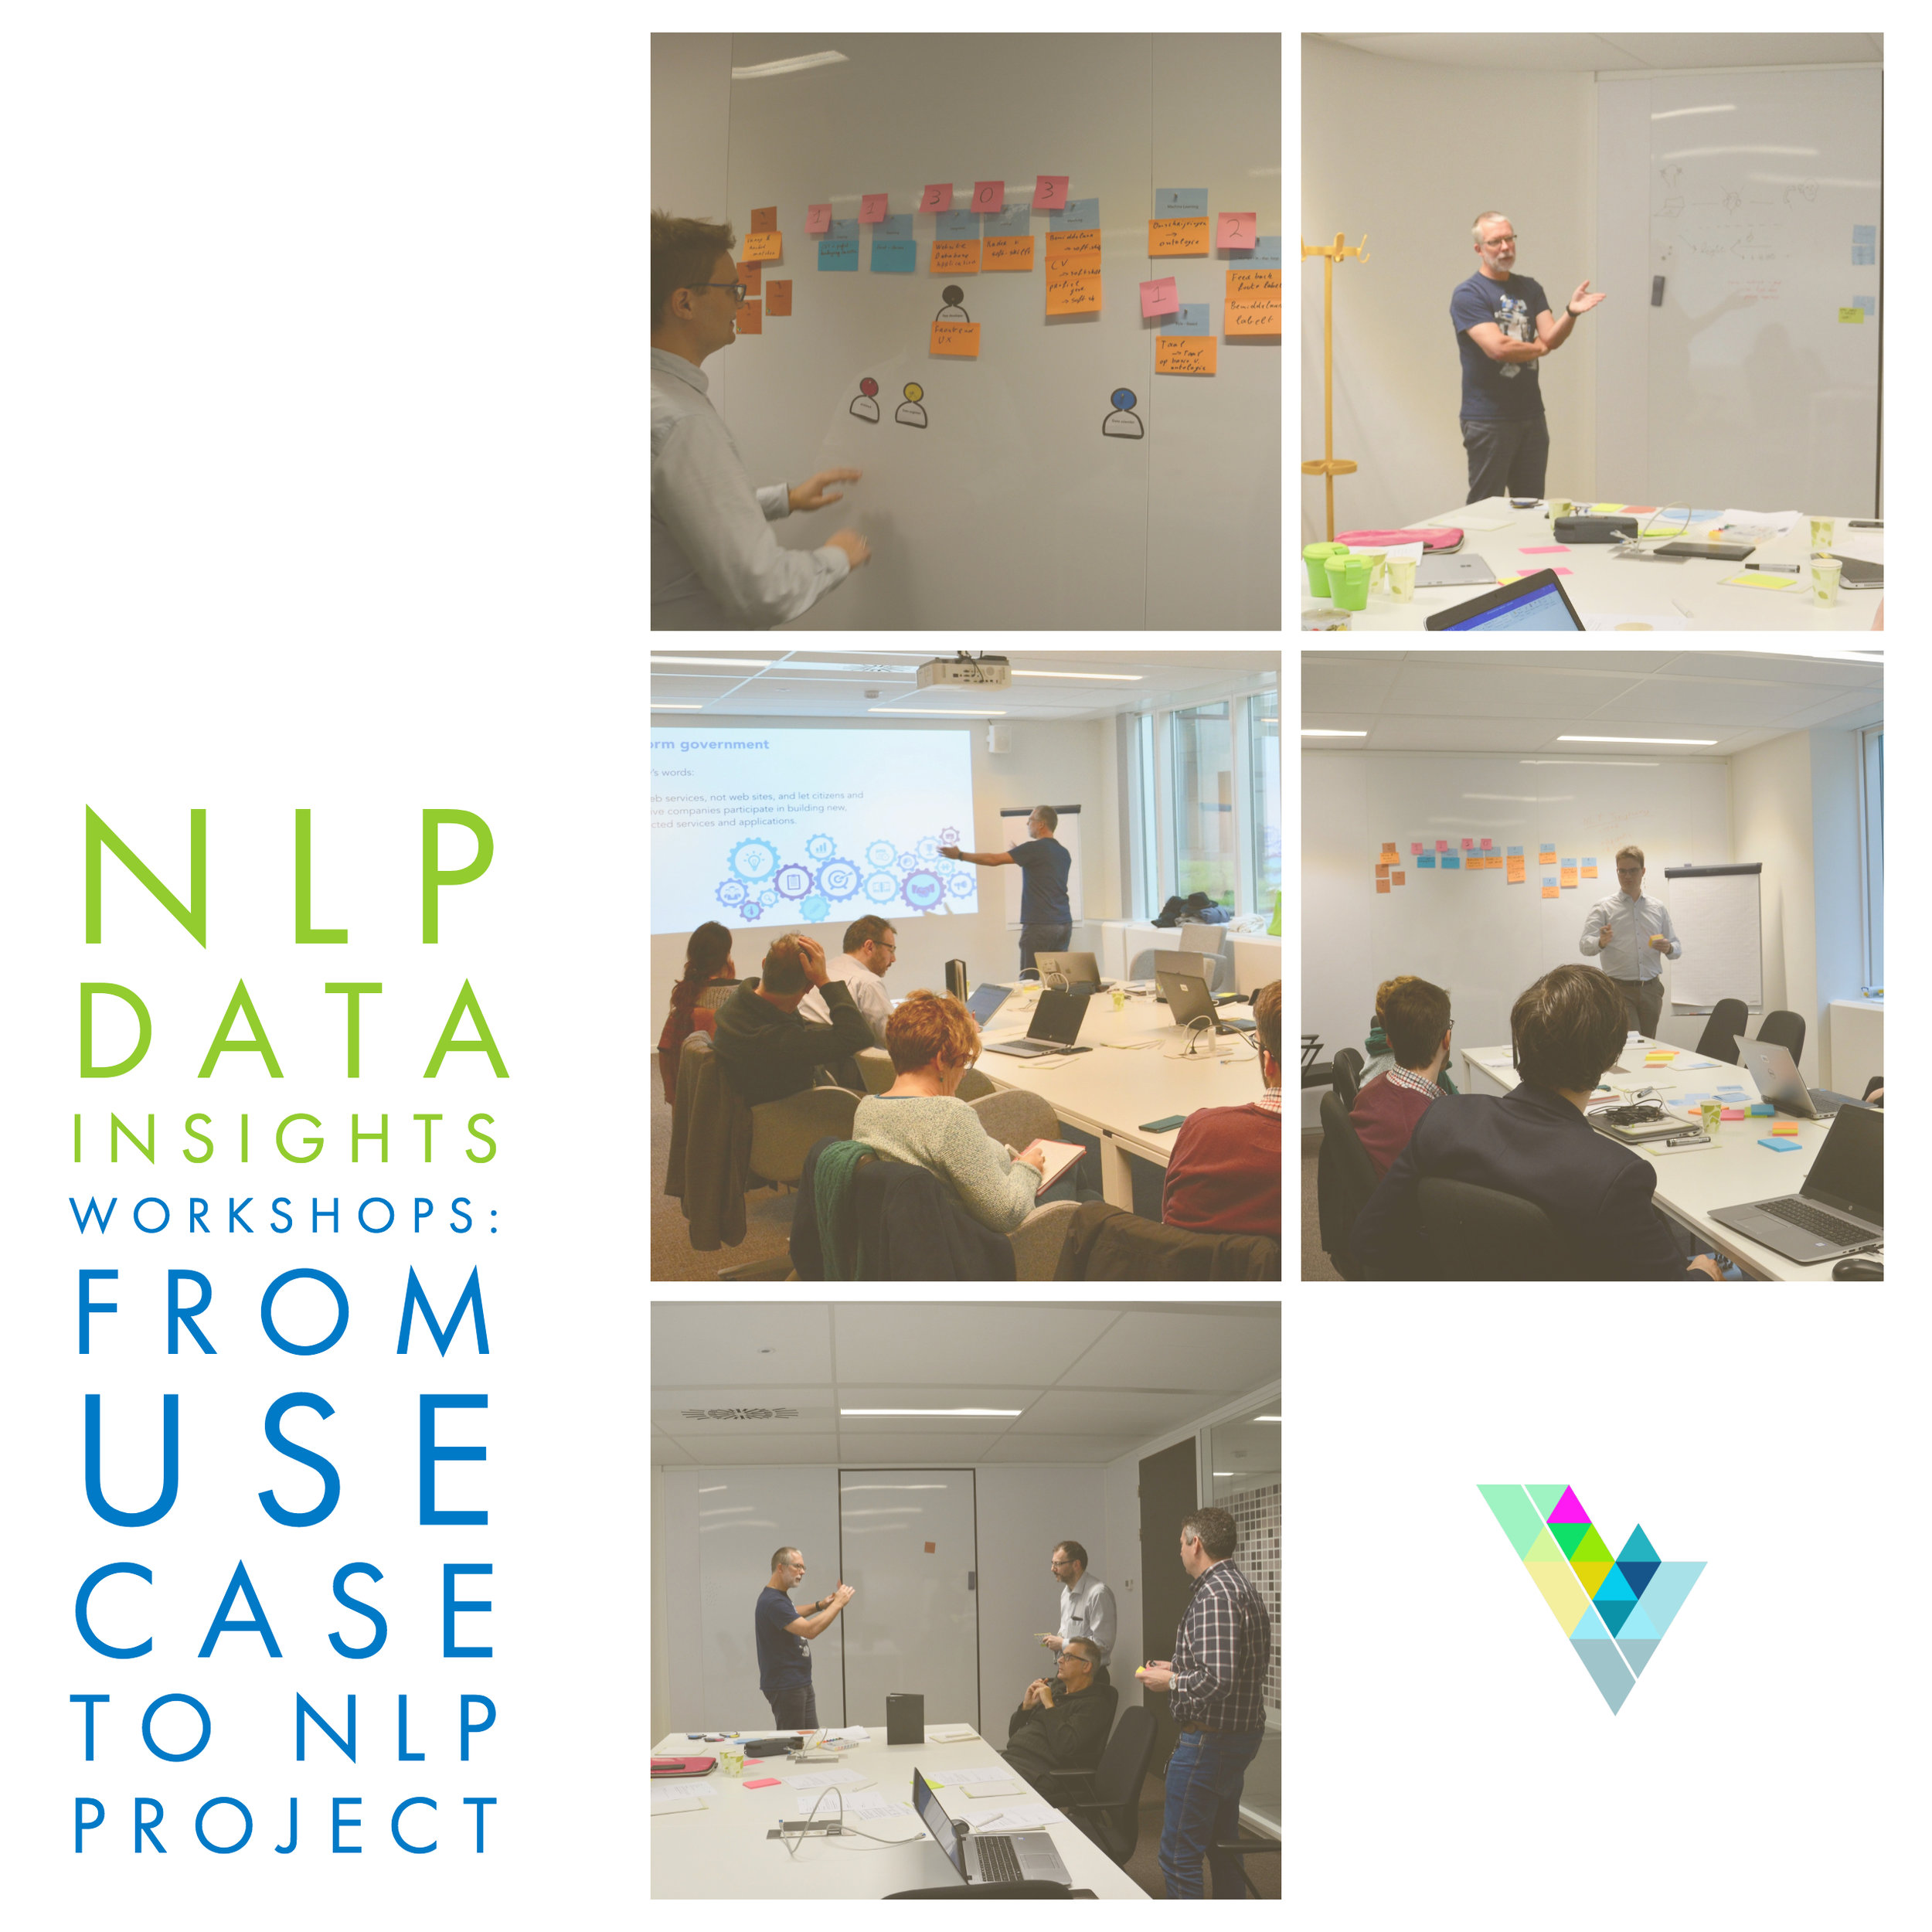 nlp workshop (1).jpg